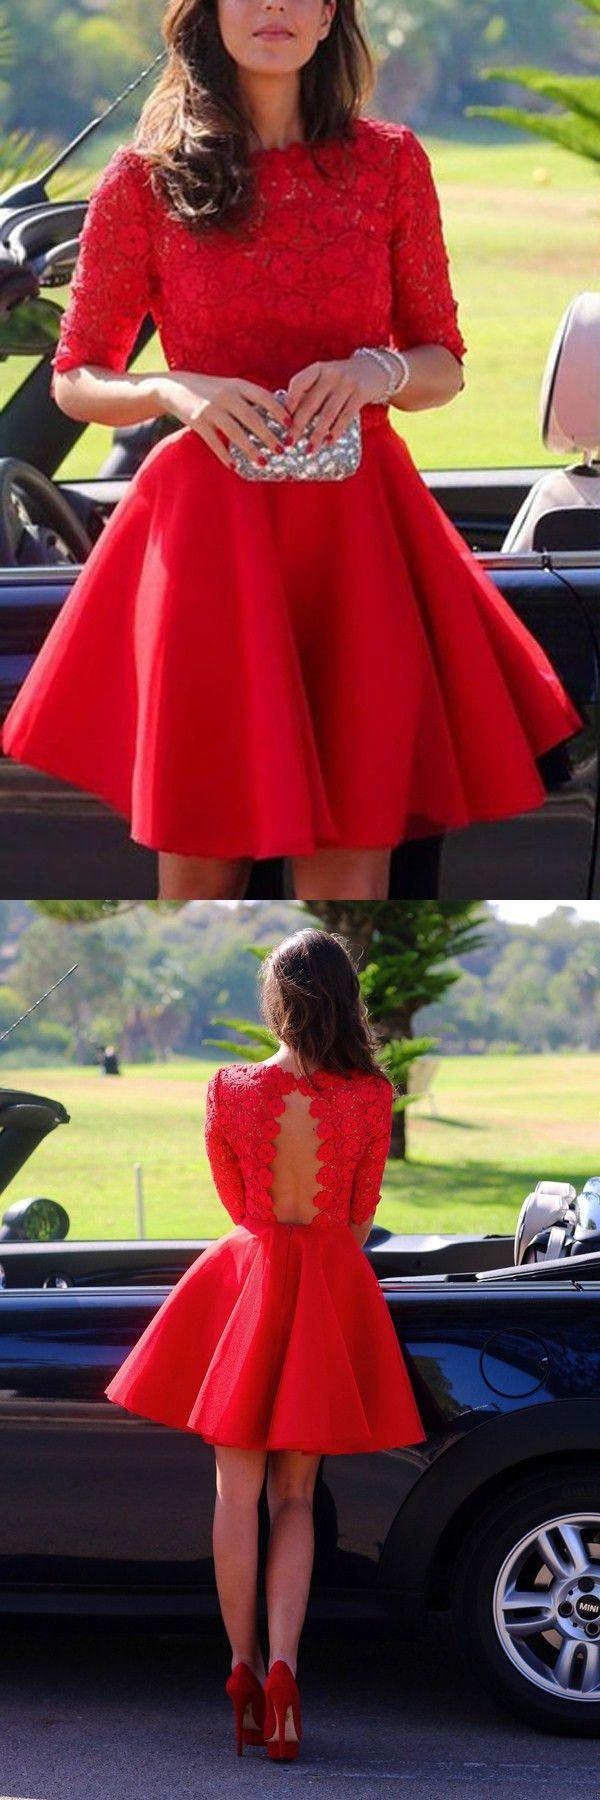 Elegant bateau aline half sleeves short red lace homecoming dress